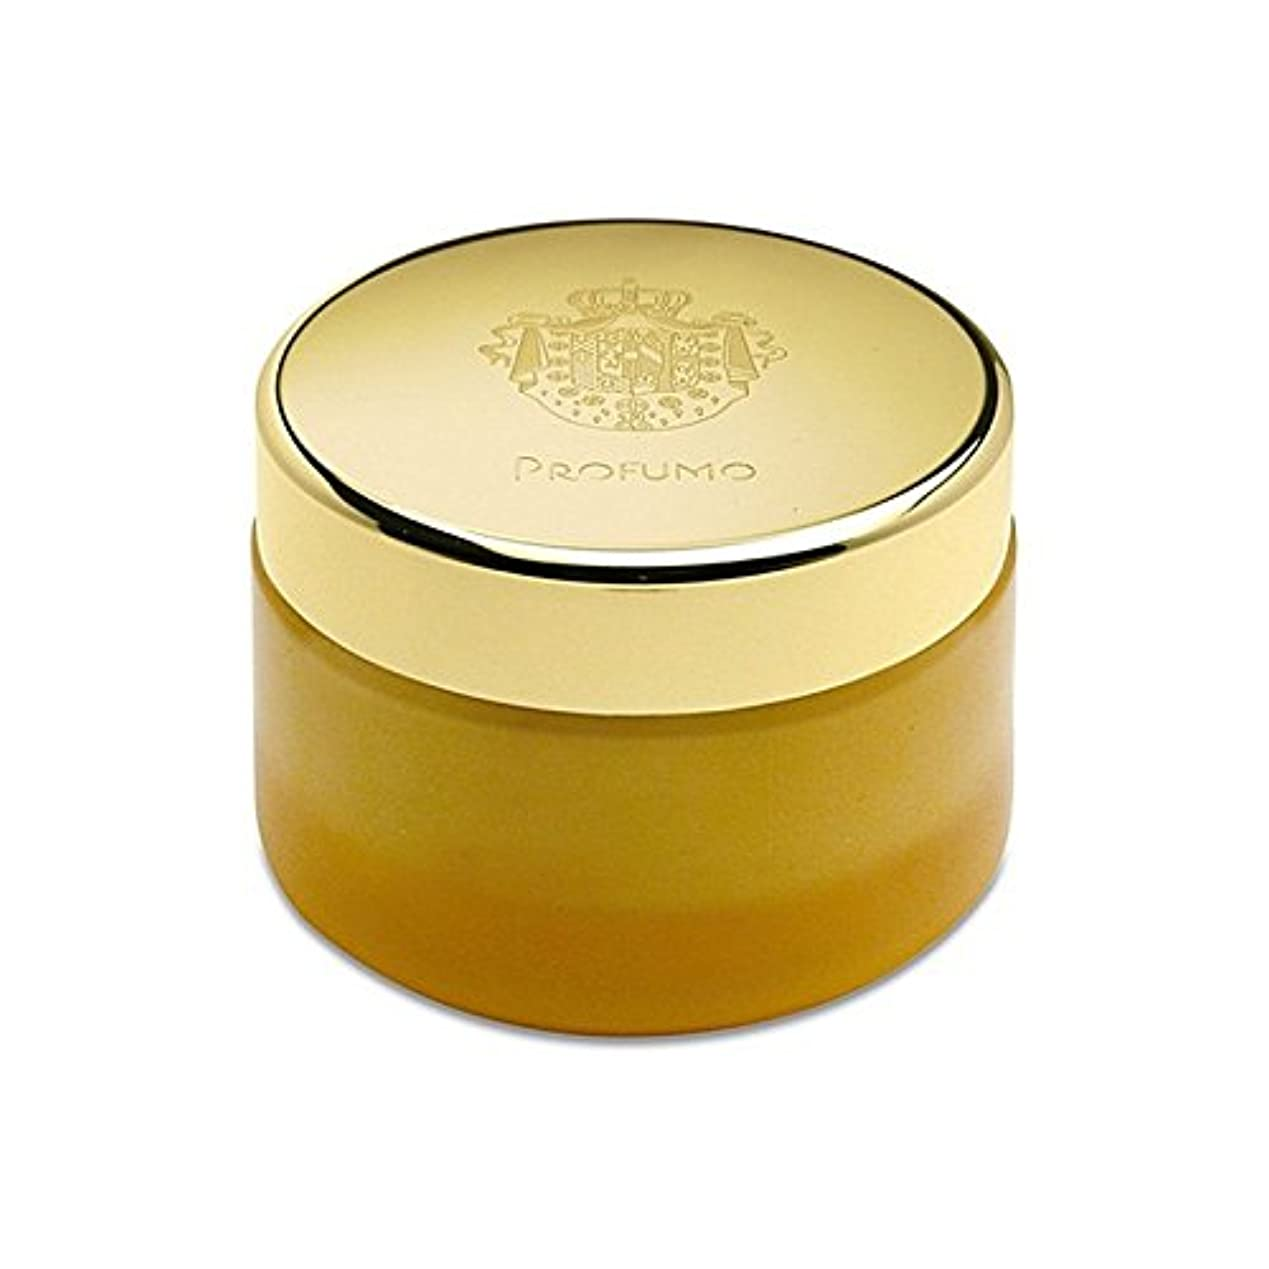 Acqua Di Parma Profumo Body Cream 200ml - アクアディパルマボディクリーム200ミリリットル [並行輸入品]